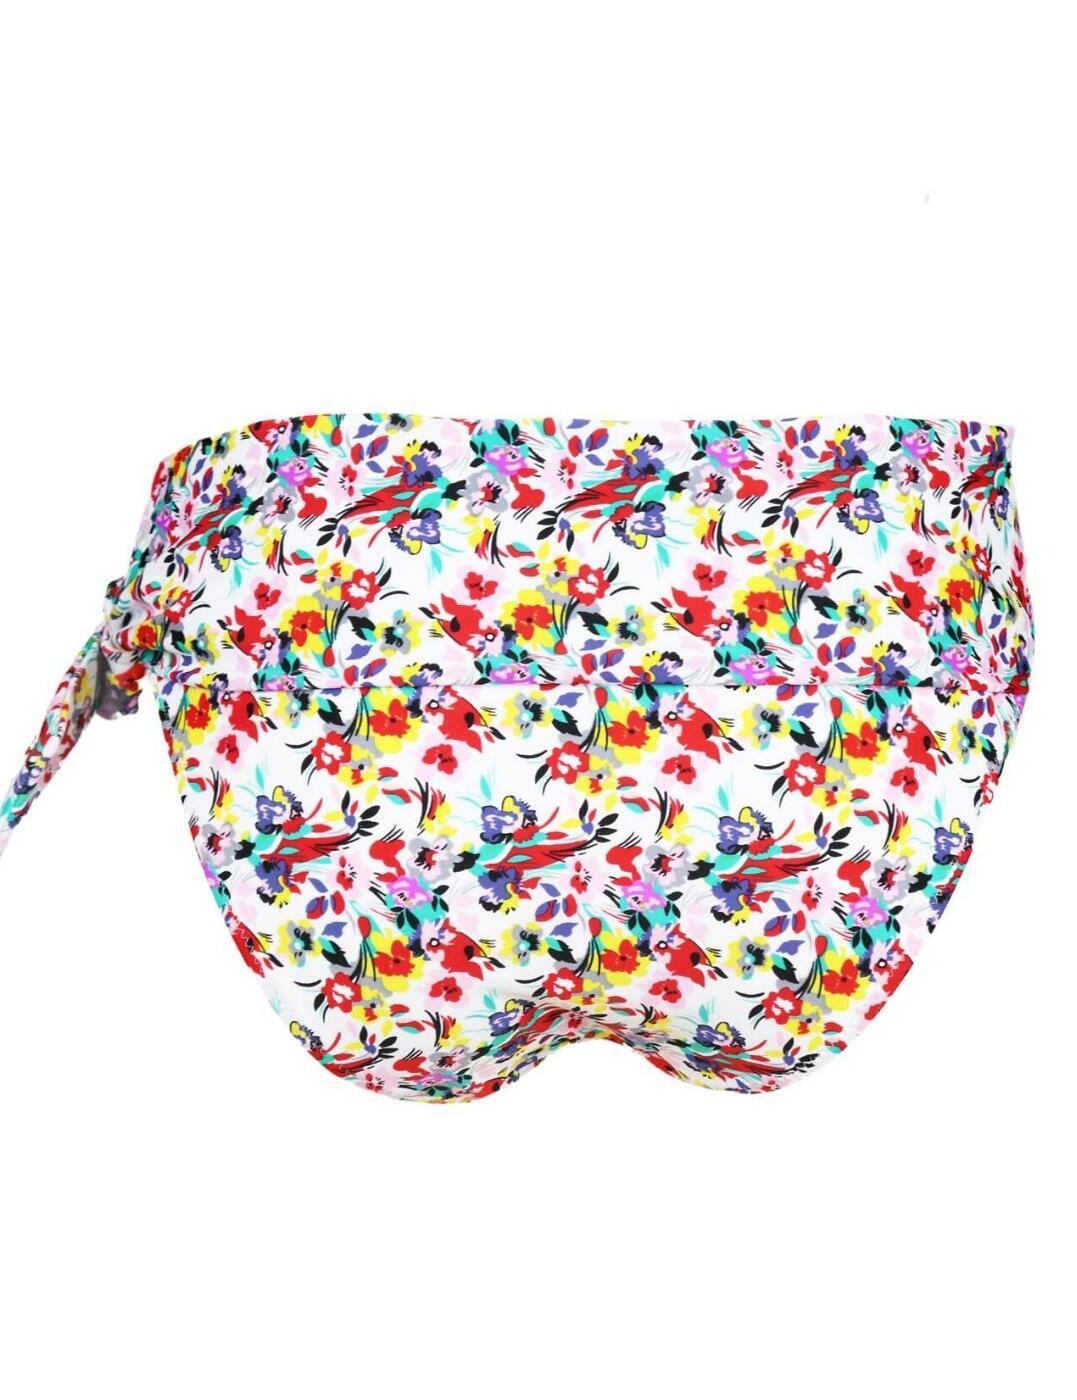 Pour-Moi-Heatwave-Fold-Over-Bikini-Brief-Bottoms-86003-New-Womens-Swimwear thumbnail 13